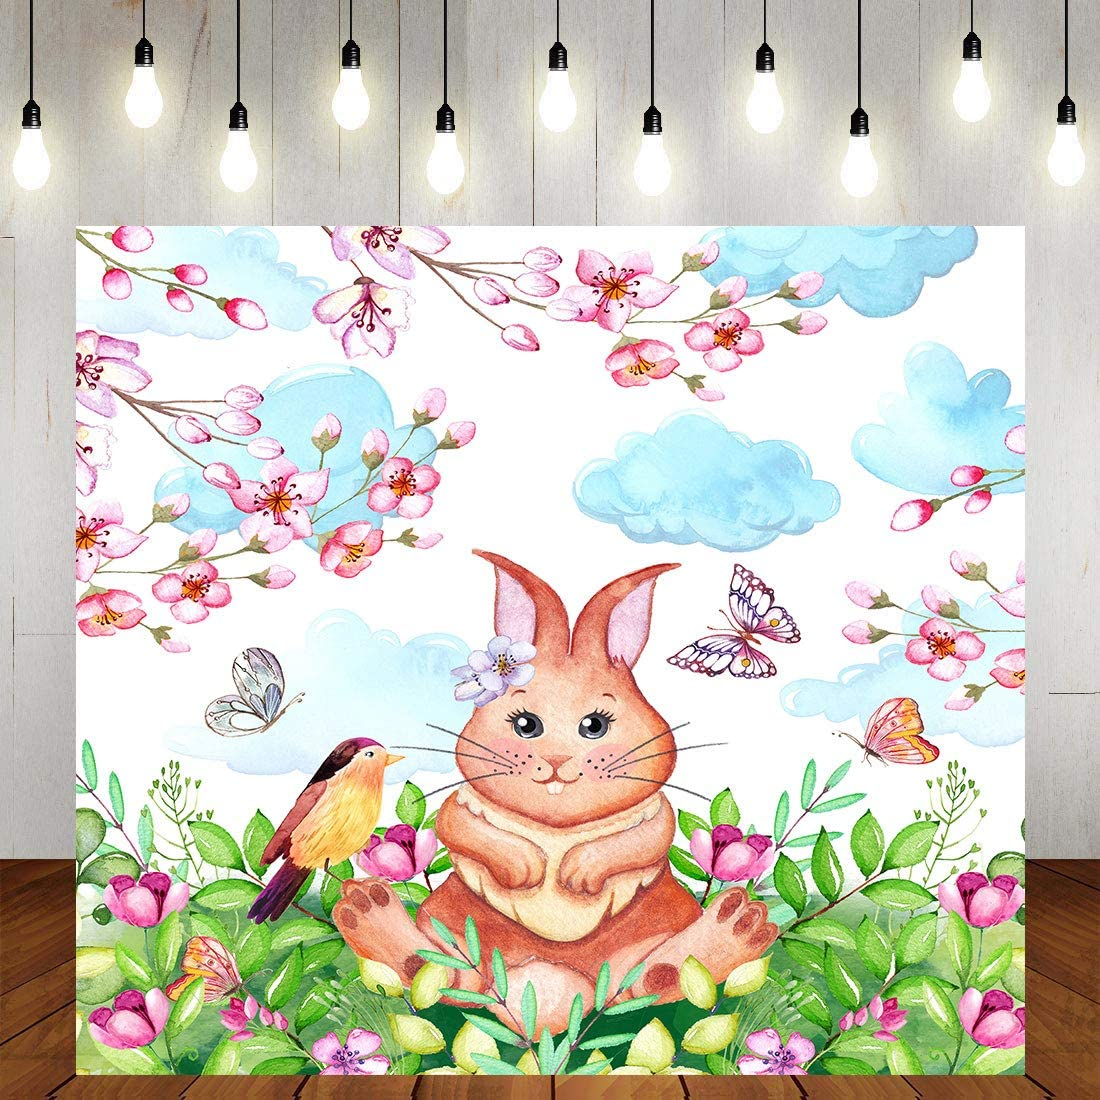 Spring Rabbit Theme Party Backdrop 6x6ft Pink Peach Bird Girl Boy Birthday Chinese Zodiac Rabbit Baby Shower Photography Background YouTube Photo Studio Prop Wallpaper LYST924